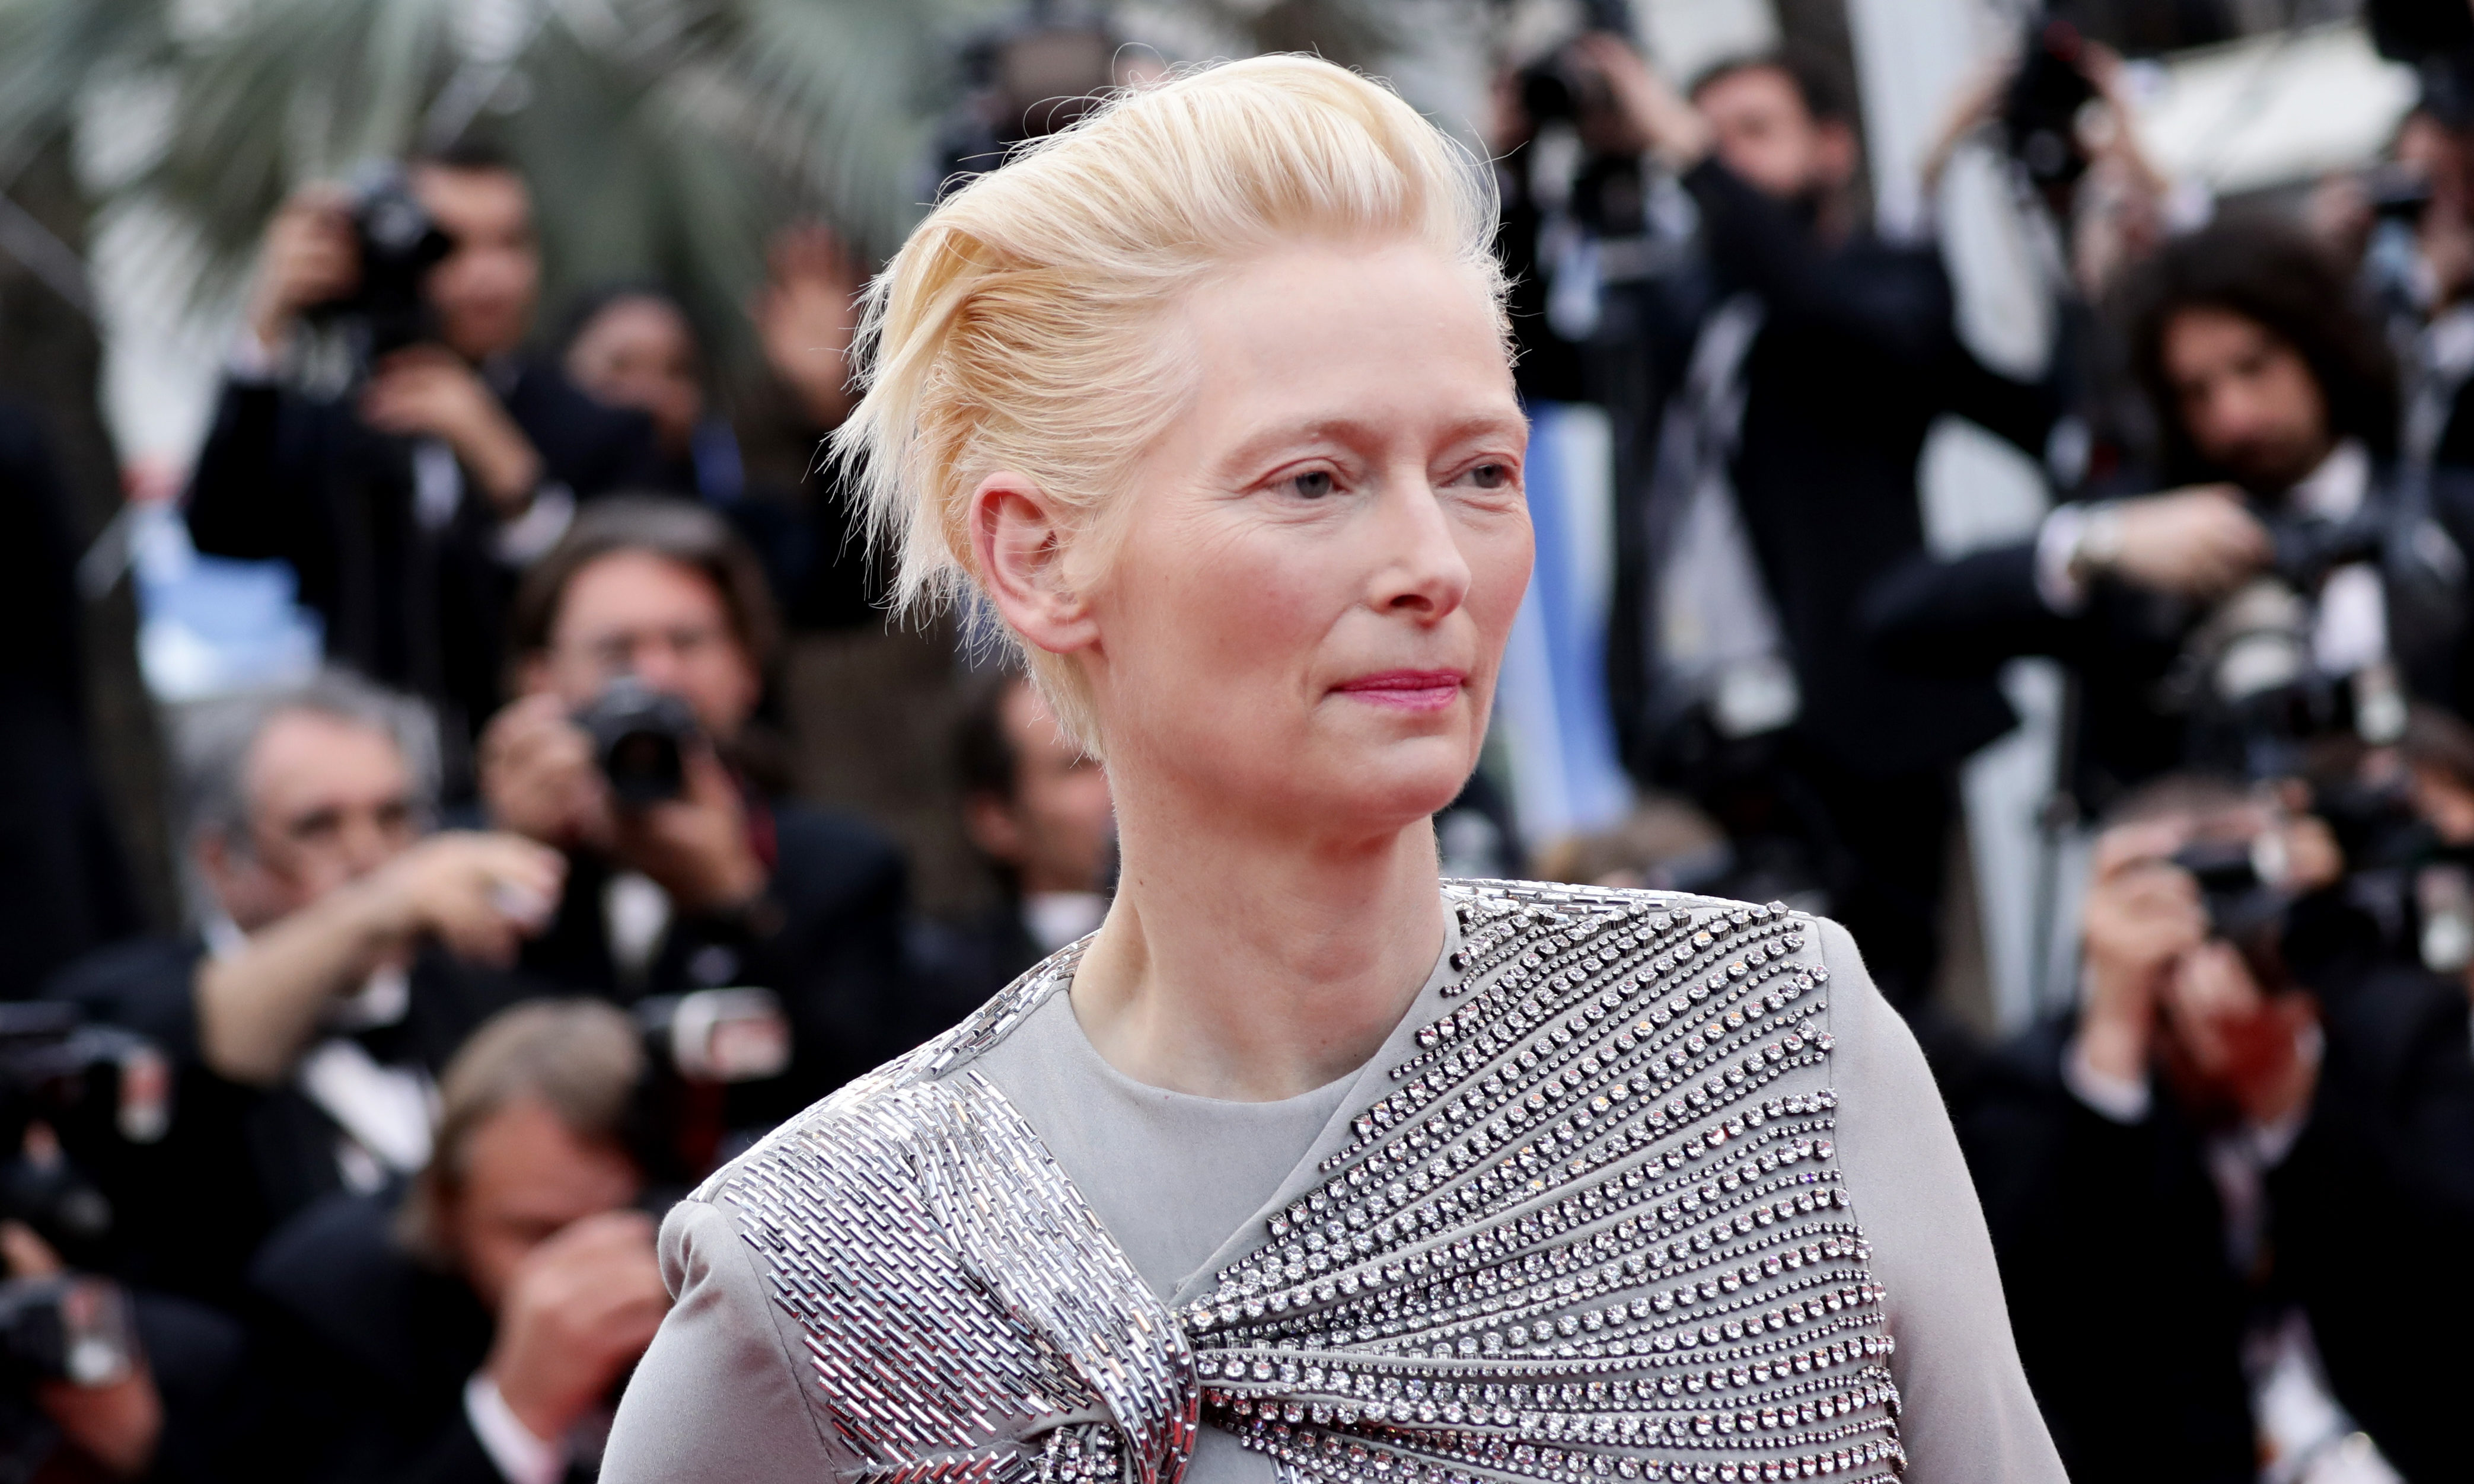 Tilda Swinton attends   the 72nd annual Cannes Film Festival